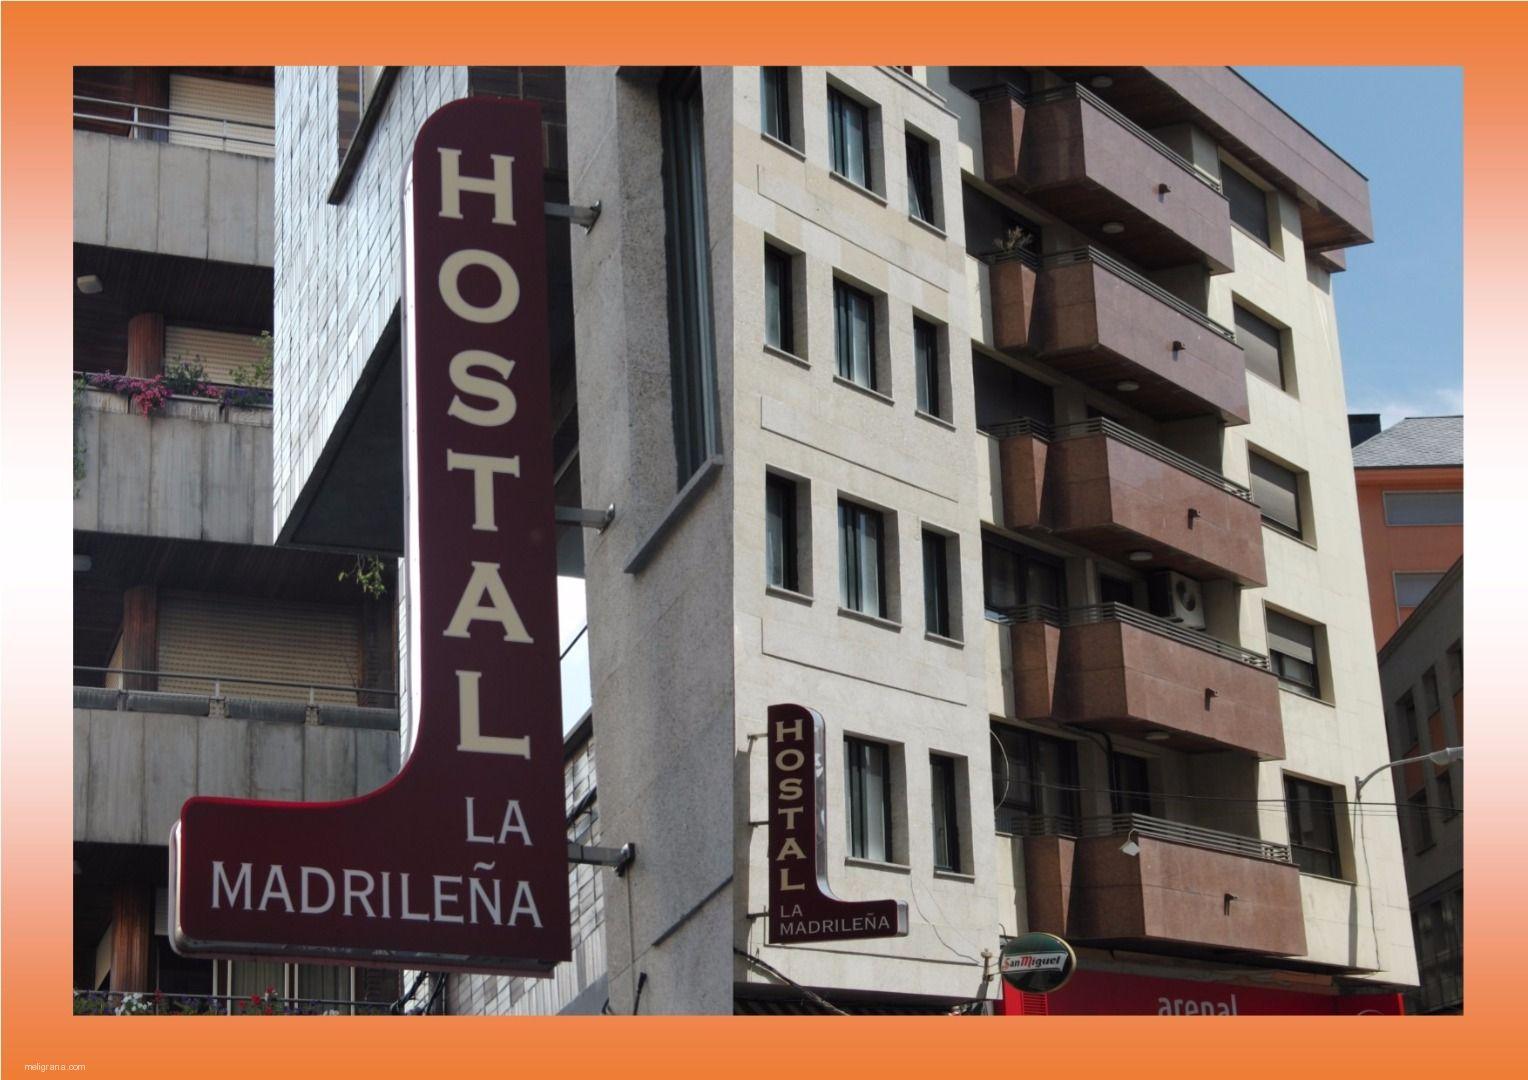 HostalLa Madrileña